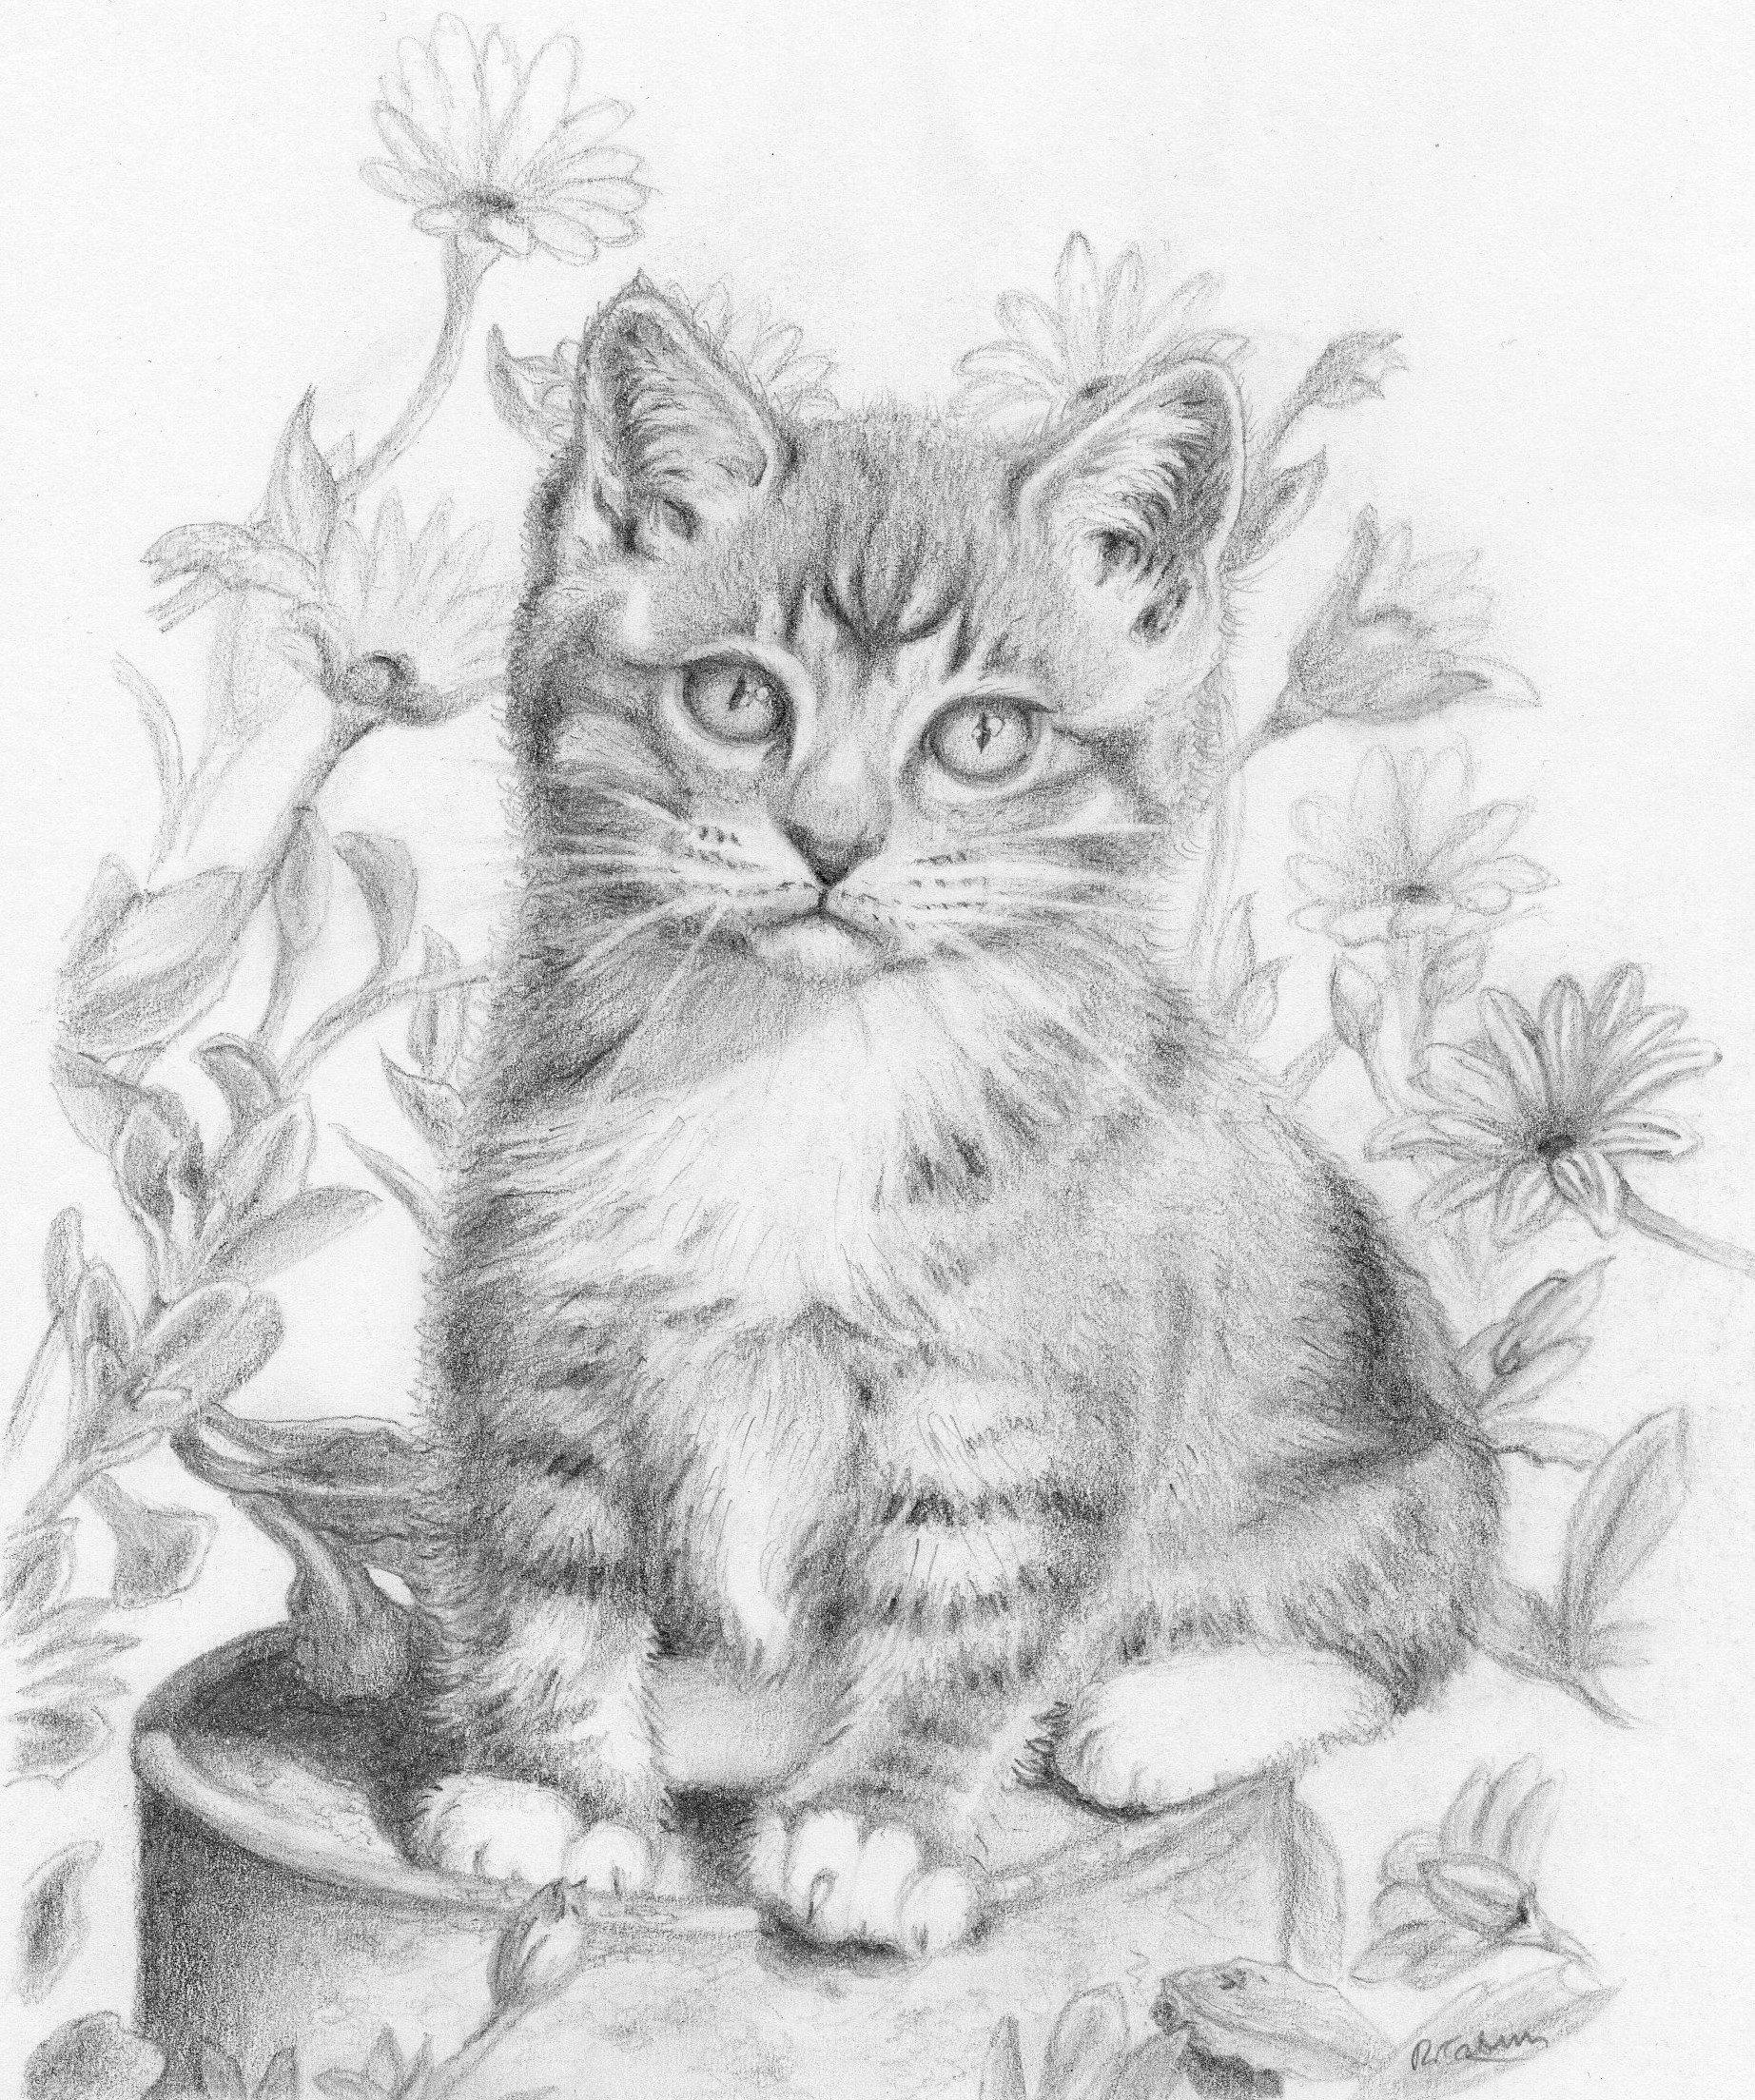 Kitten graphite pencil drawing blank greeting card